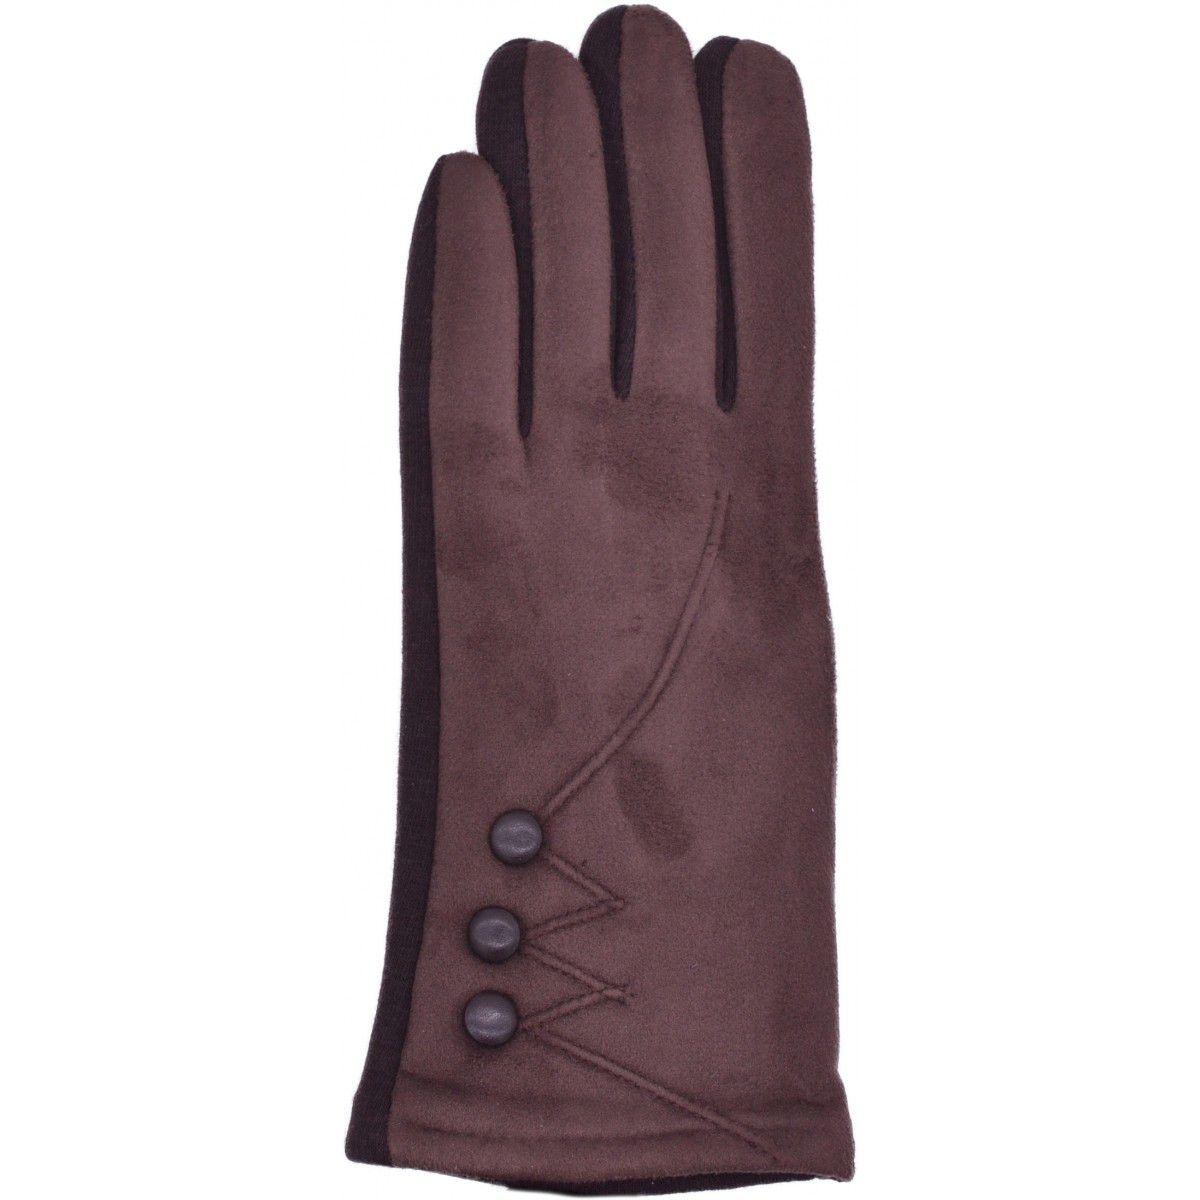 eae27111ch_gants-pin-up-retro-vintage-glamour-40-s-50-s-rosalie-chocolat